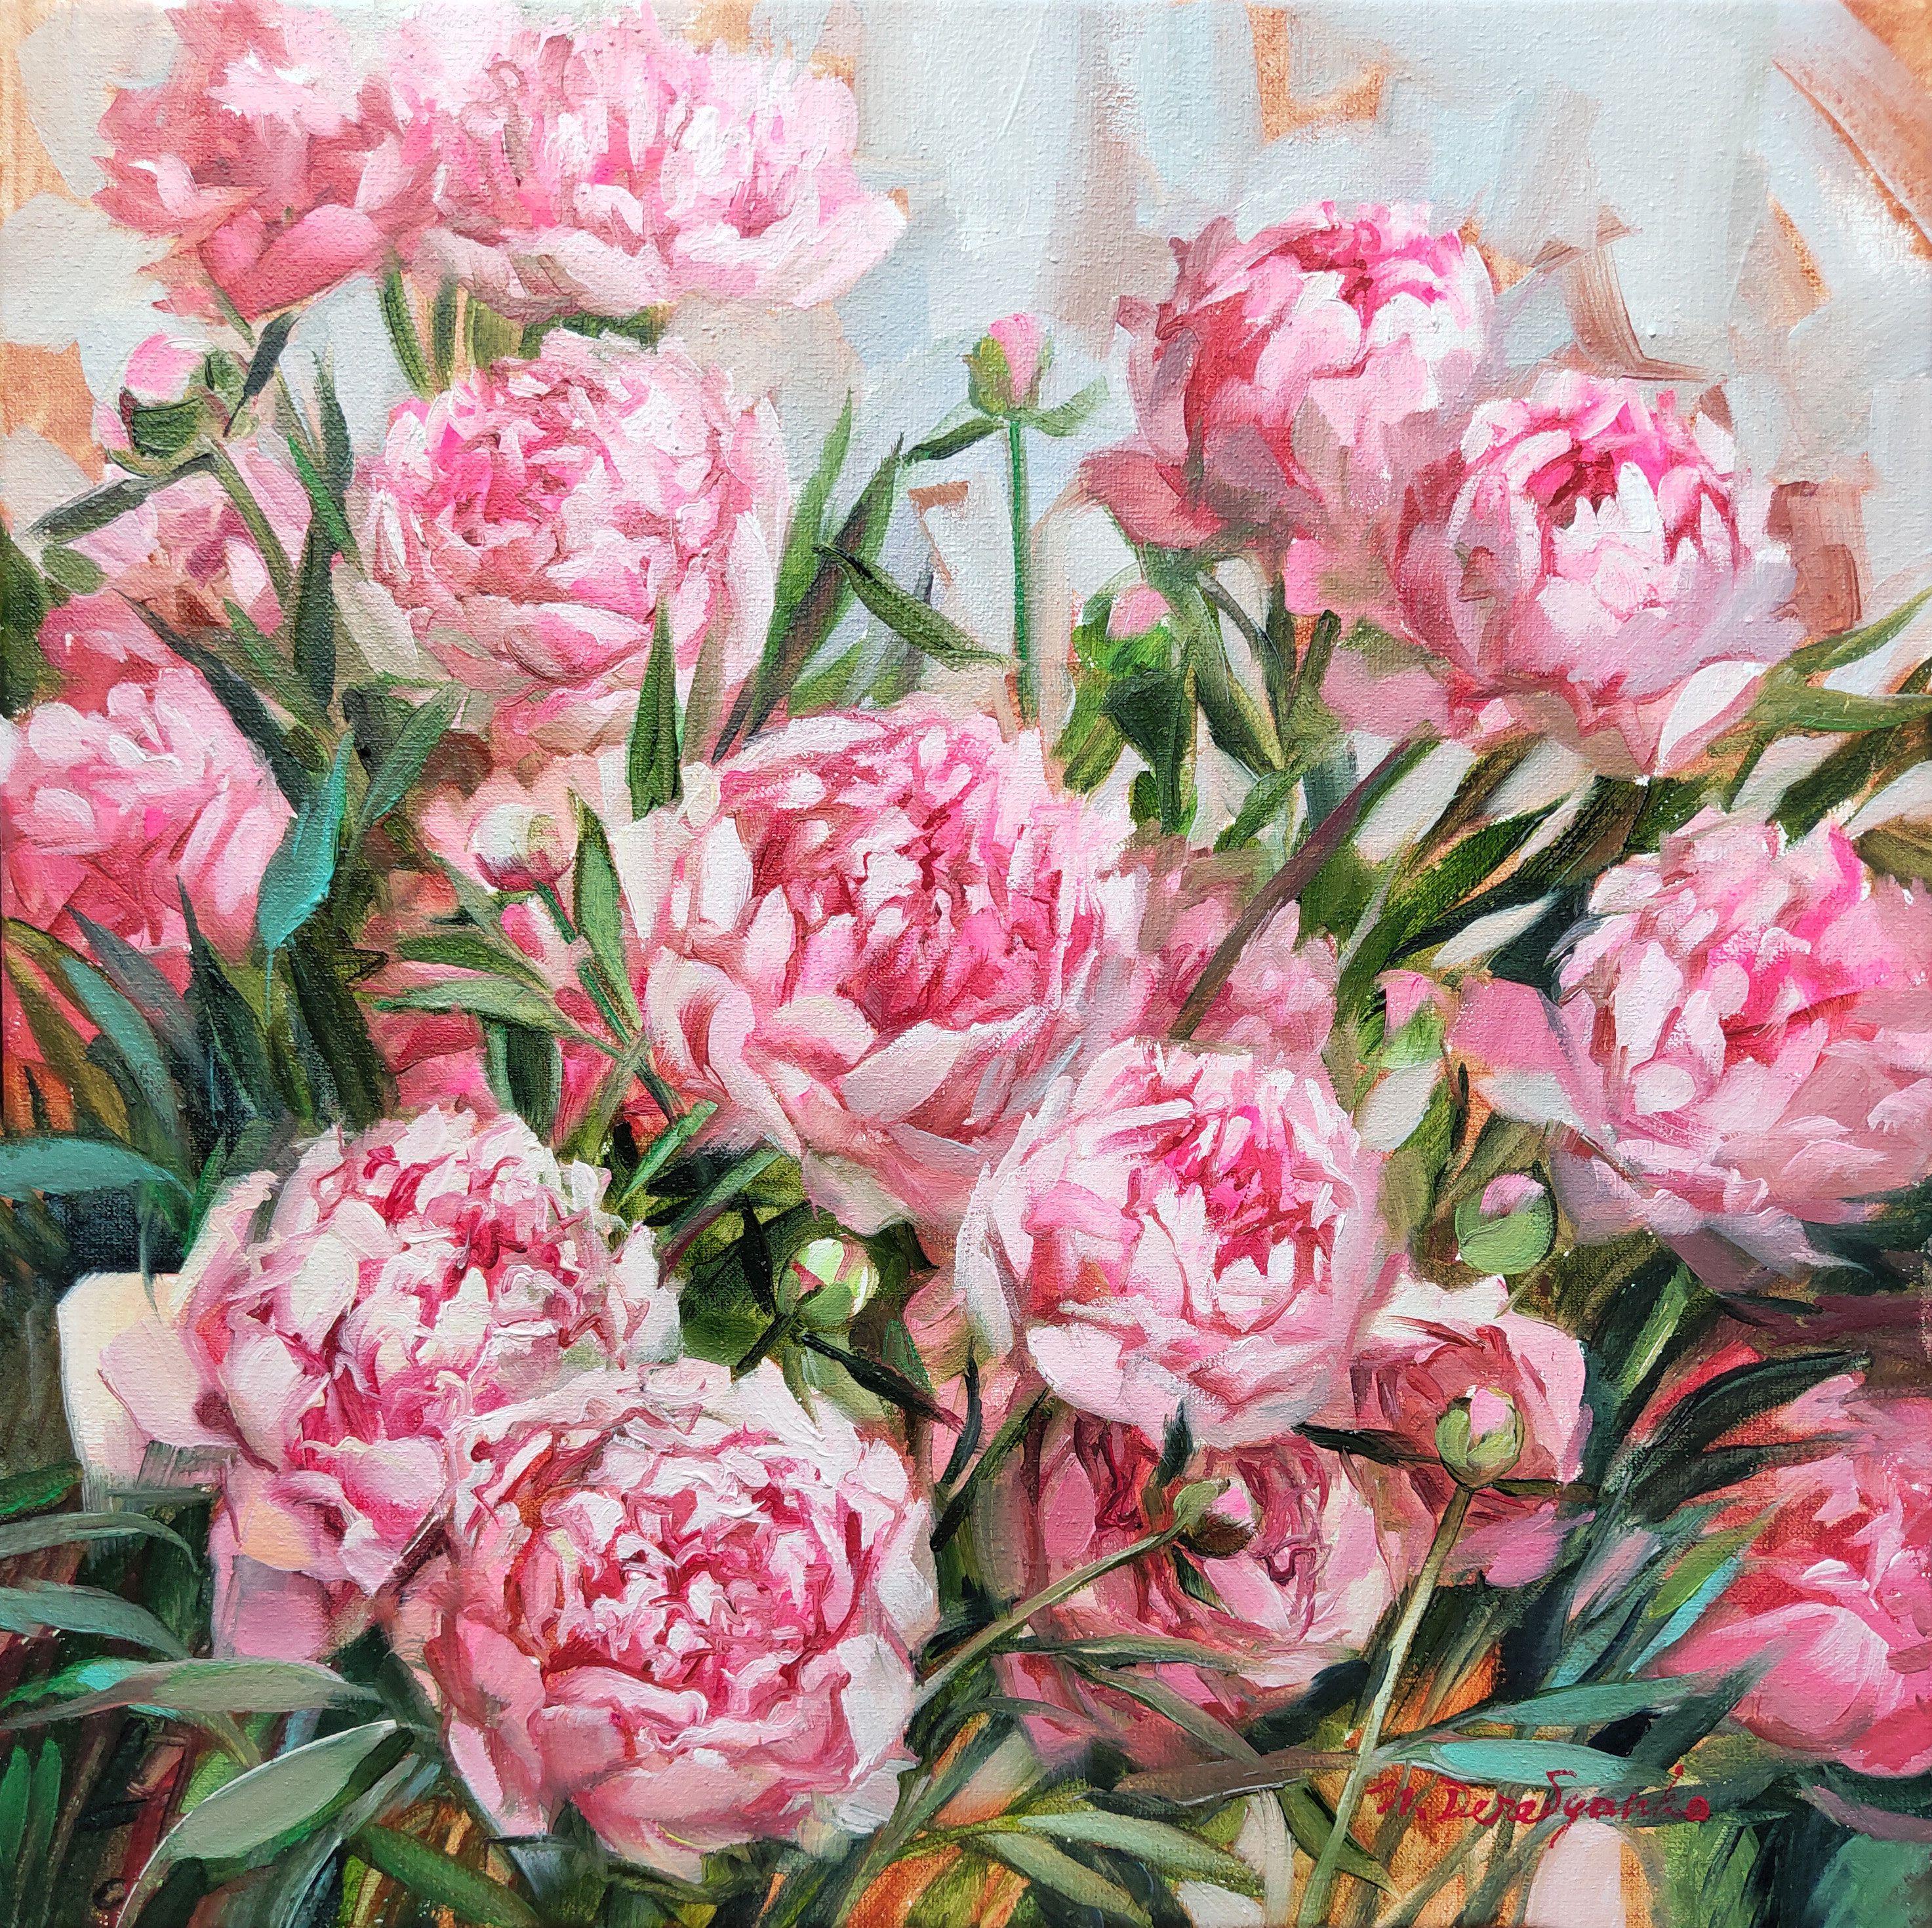 Peony Art Painting Original Flower Oil Painting On Canvas Bright